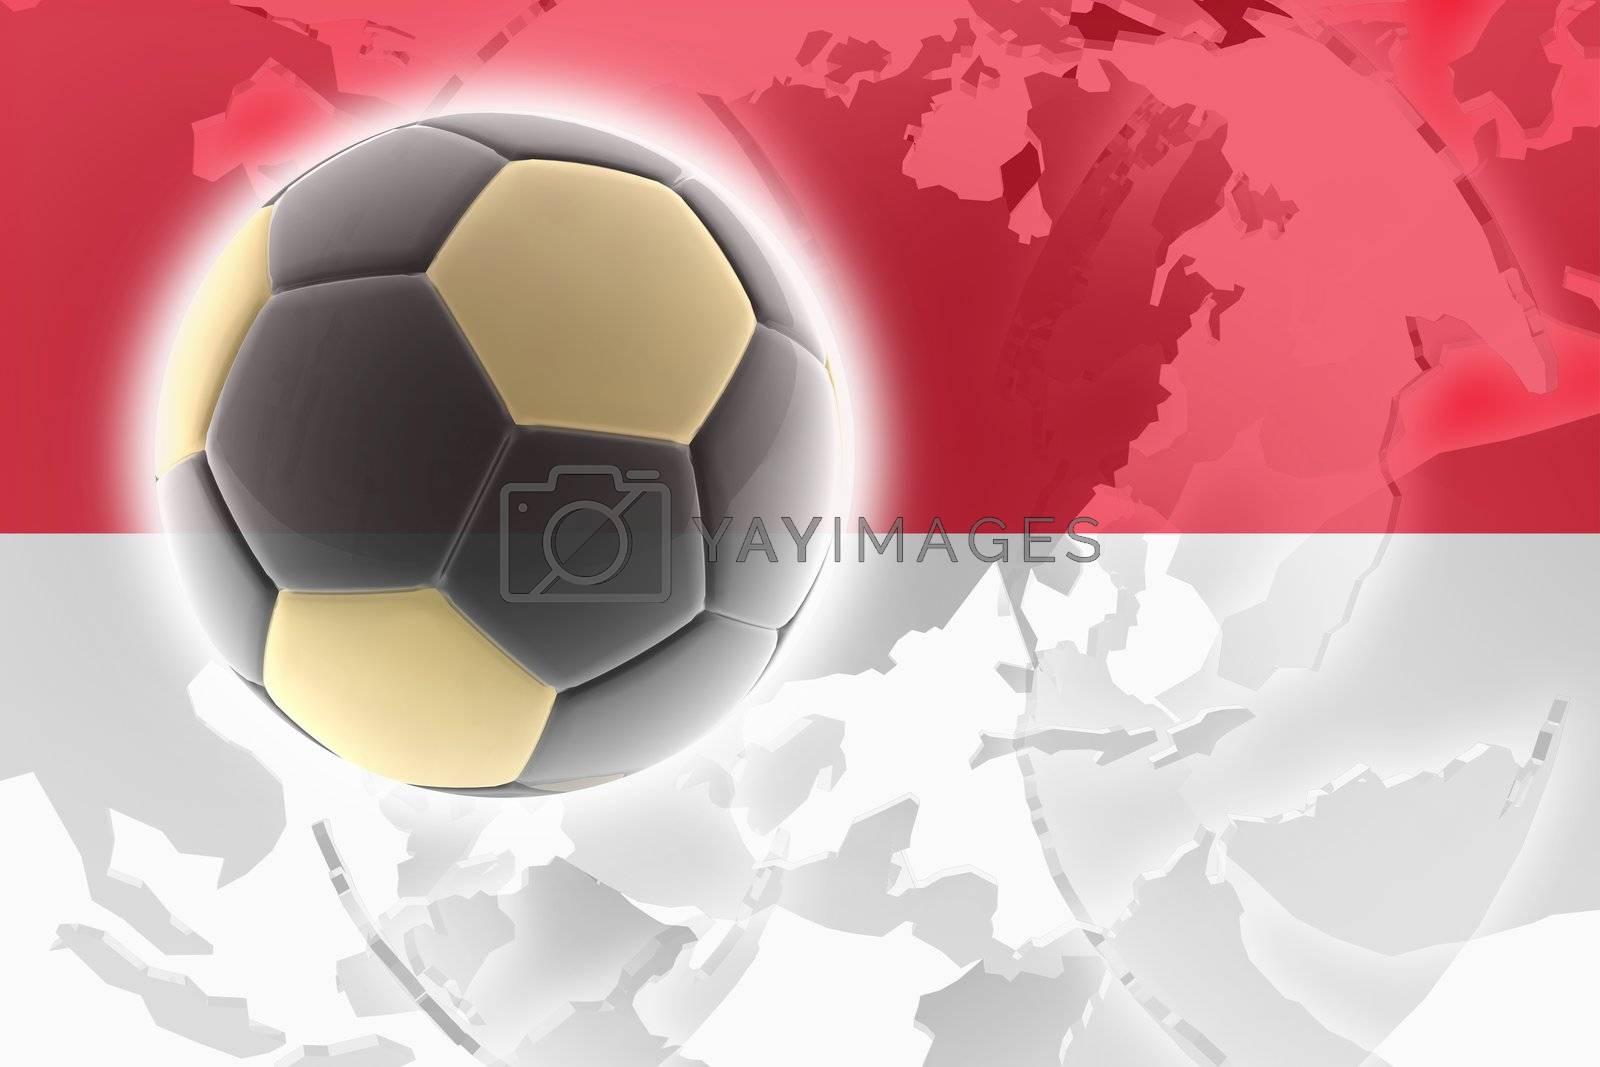 Flag of Monaco, national country symbol illustration sports soccer football